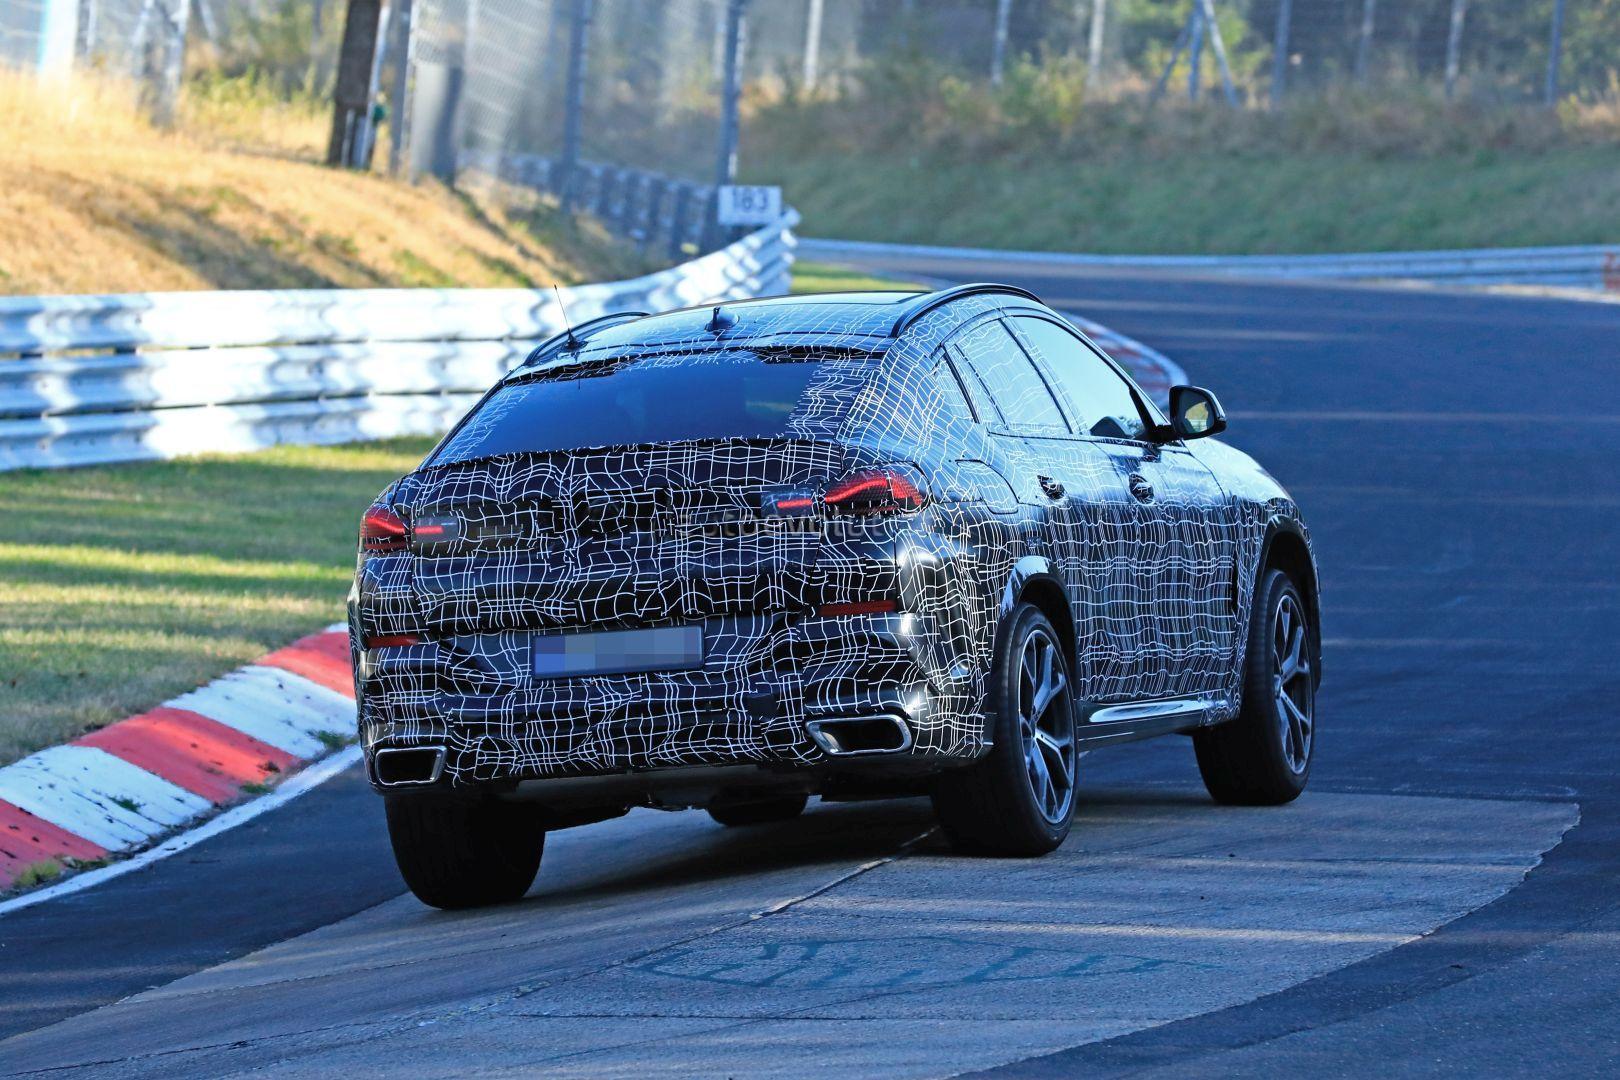 2020-bmw-x6-laps-nurburgring-prototype-reveals-sharper-look_8